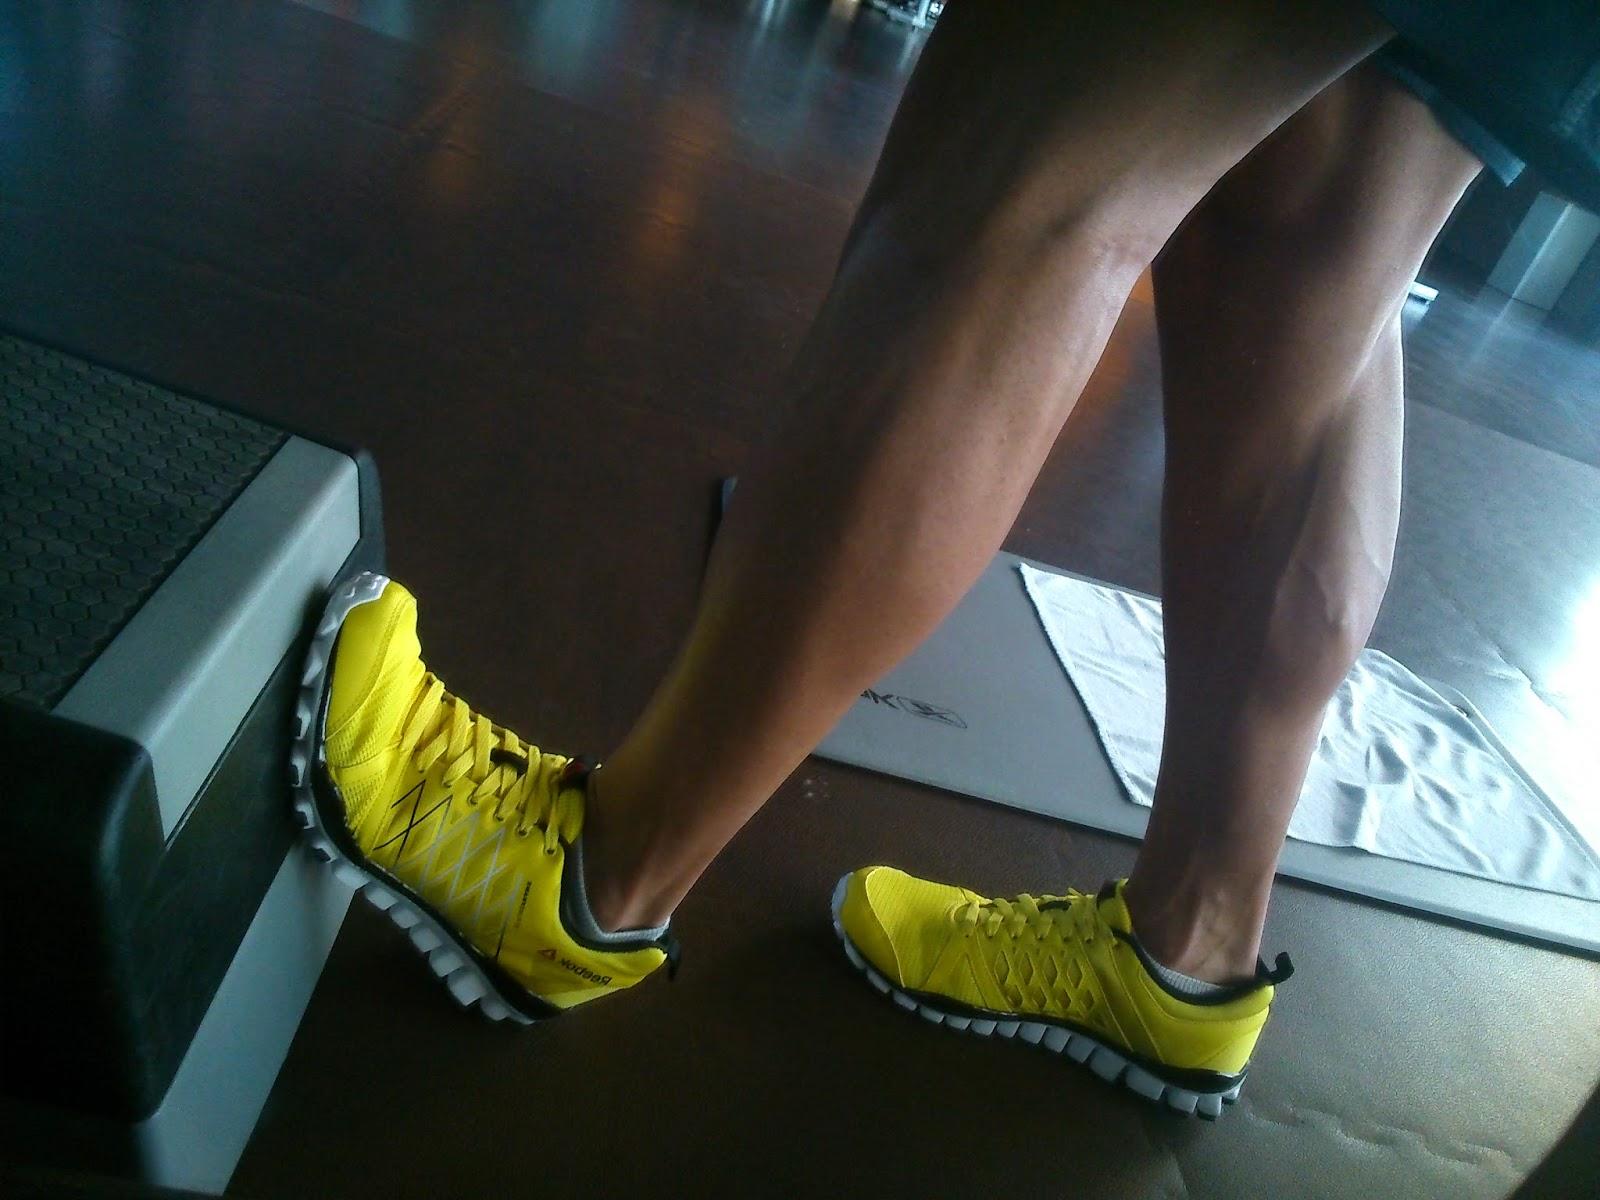 zapatillas crossfit fitness gimnasio reebok